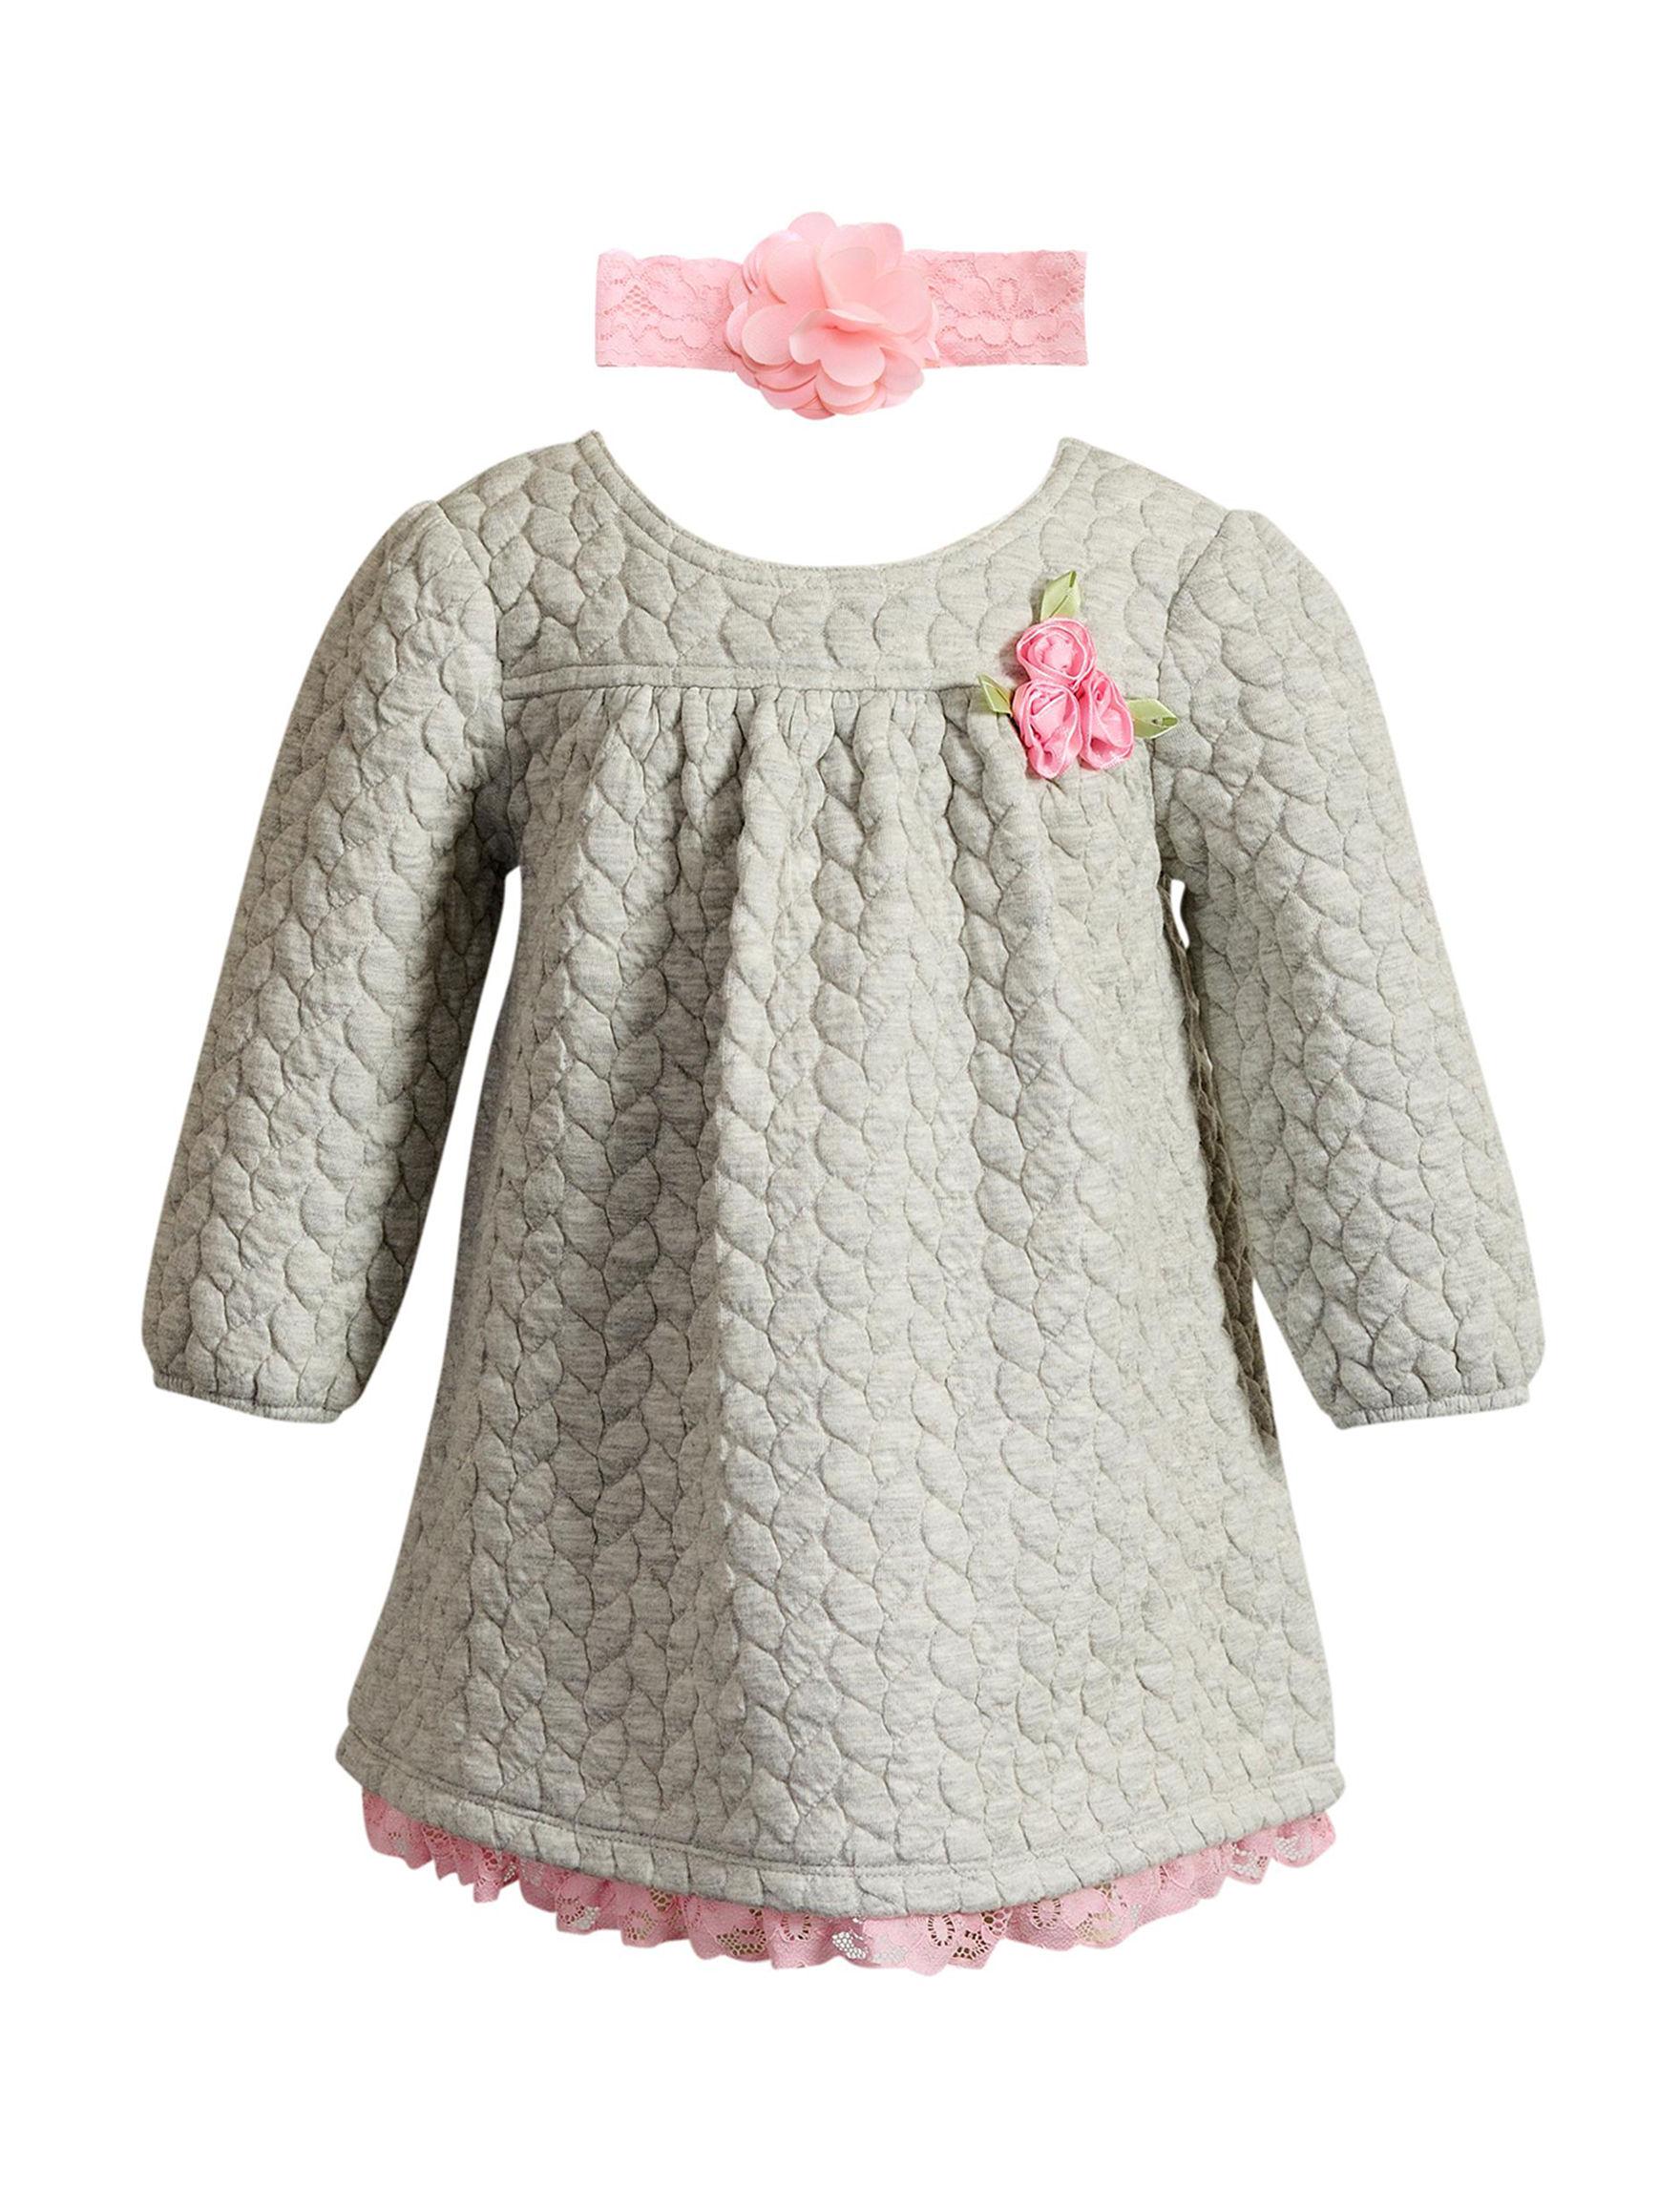 Youngland Grey / Pink